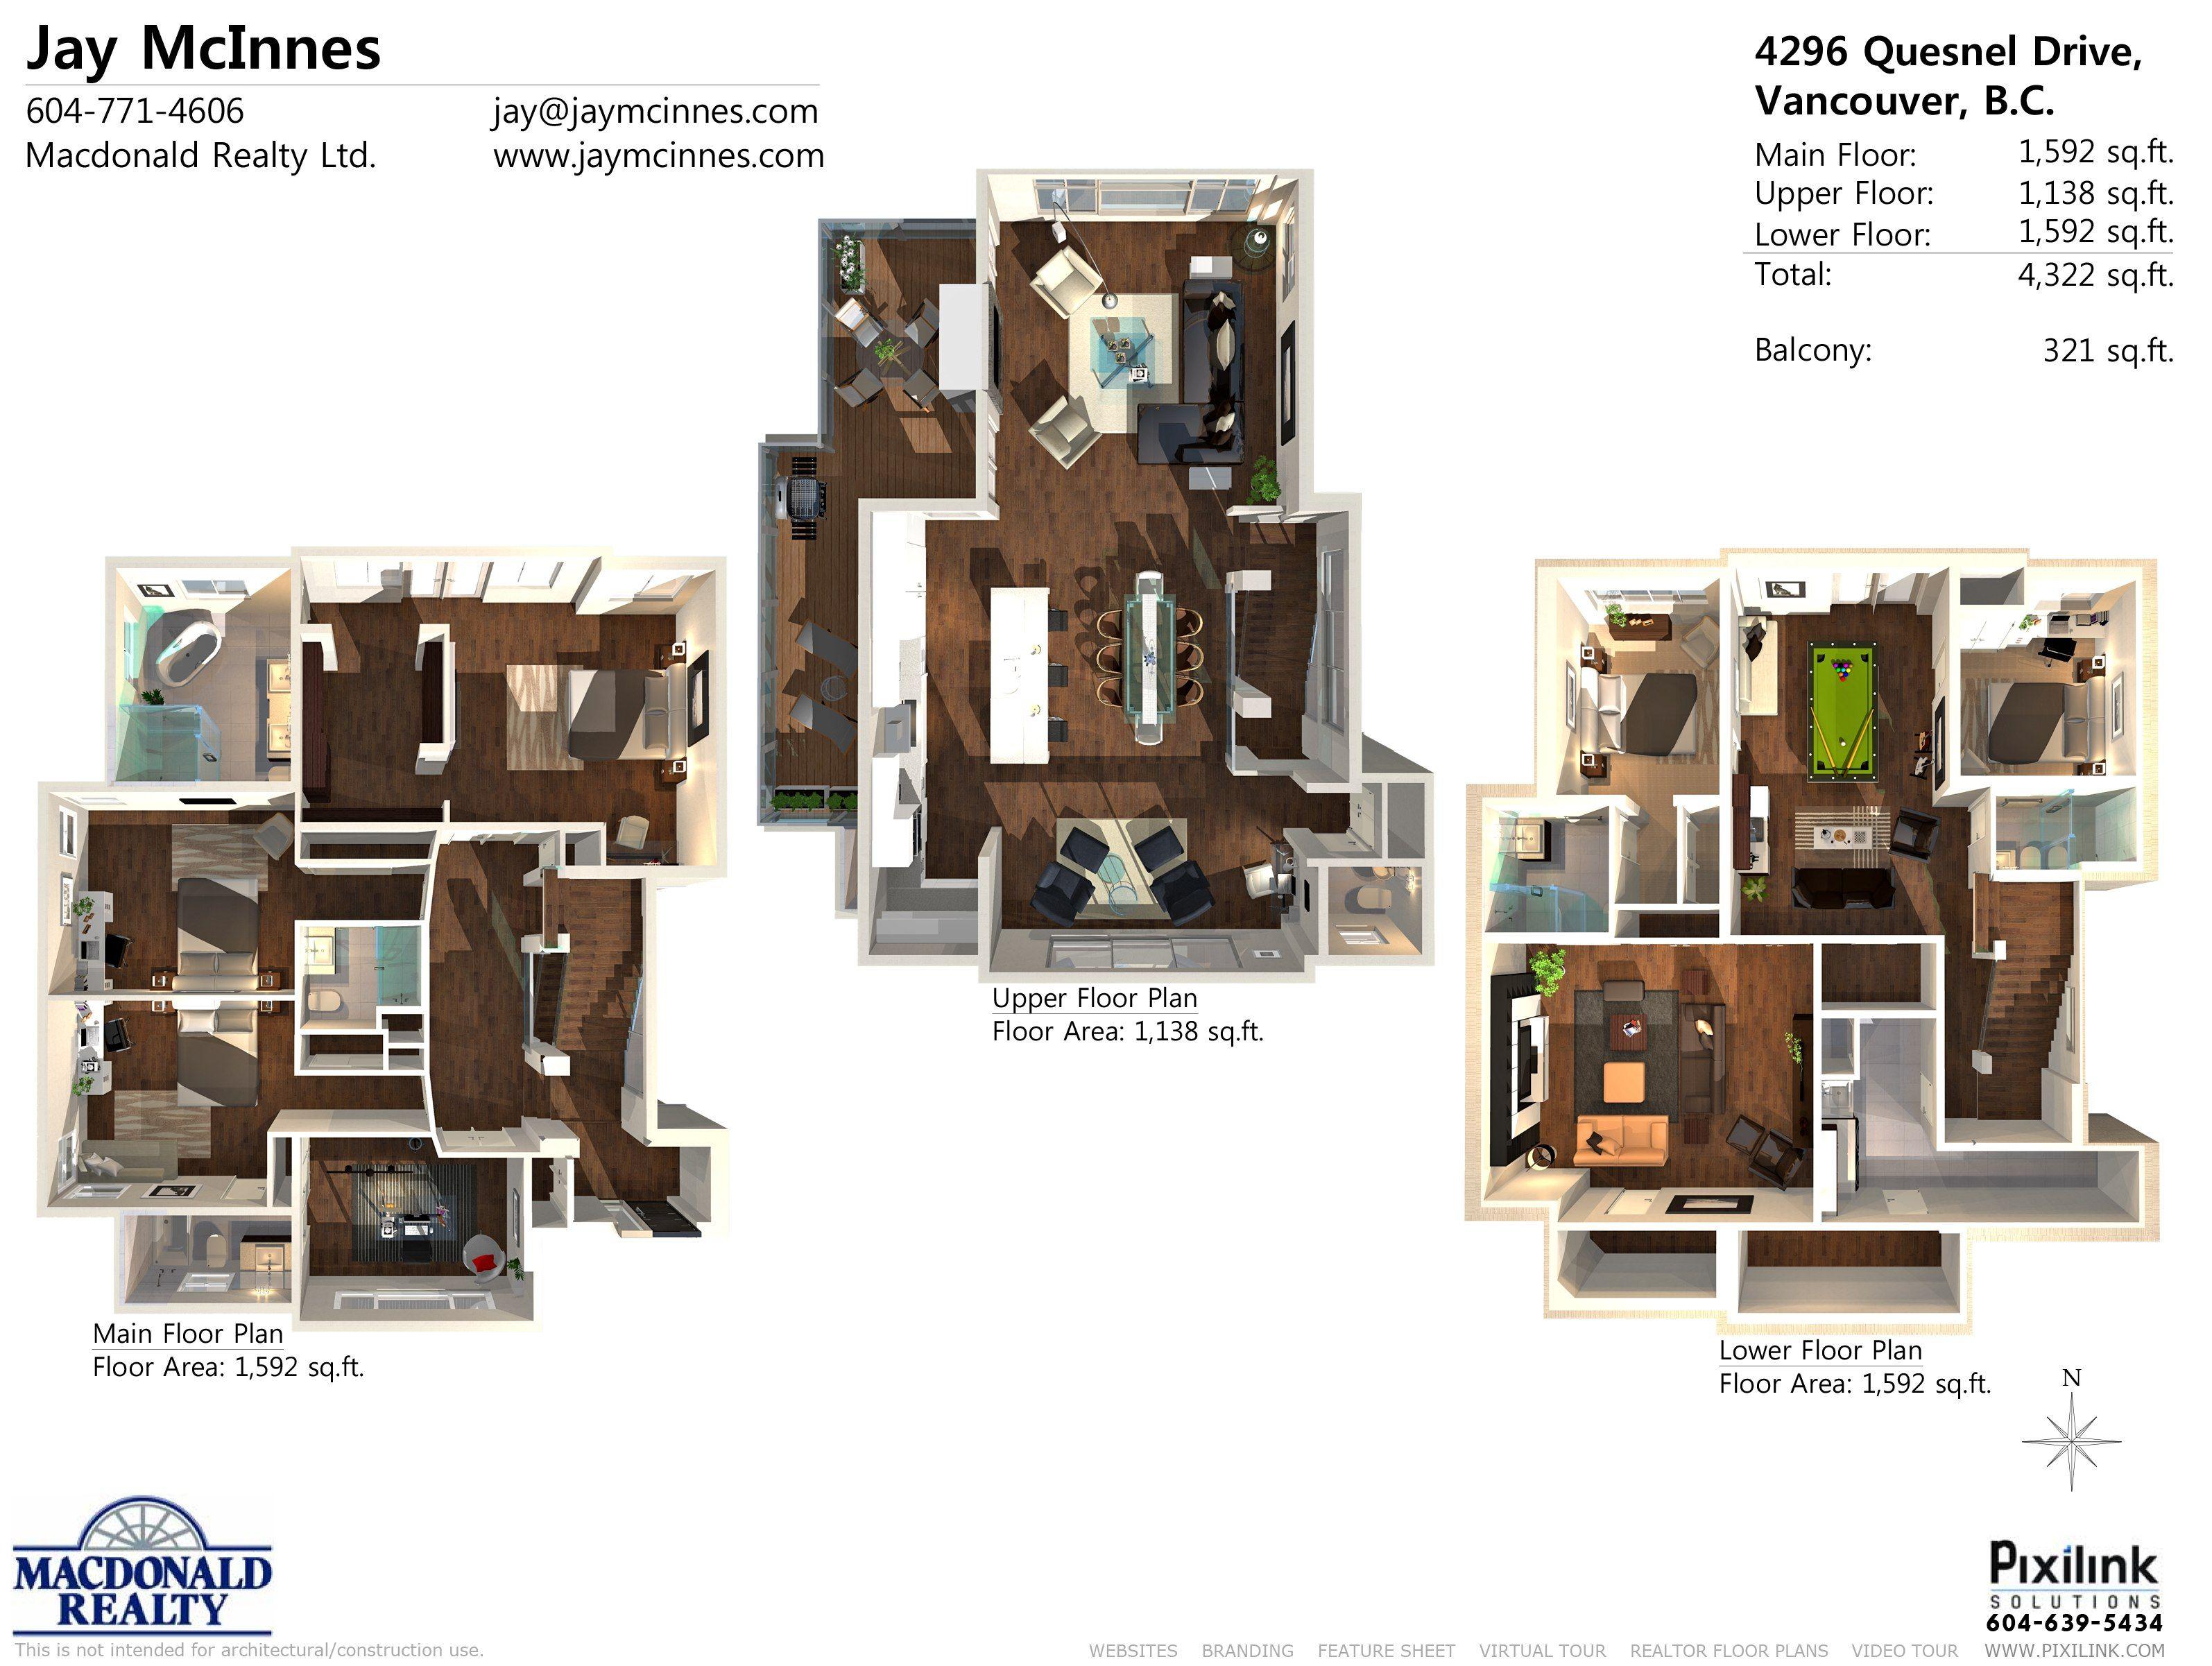 3d mansion floor plans Google Search Mansion floor